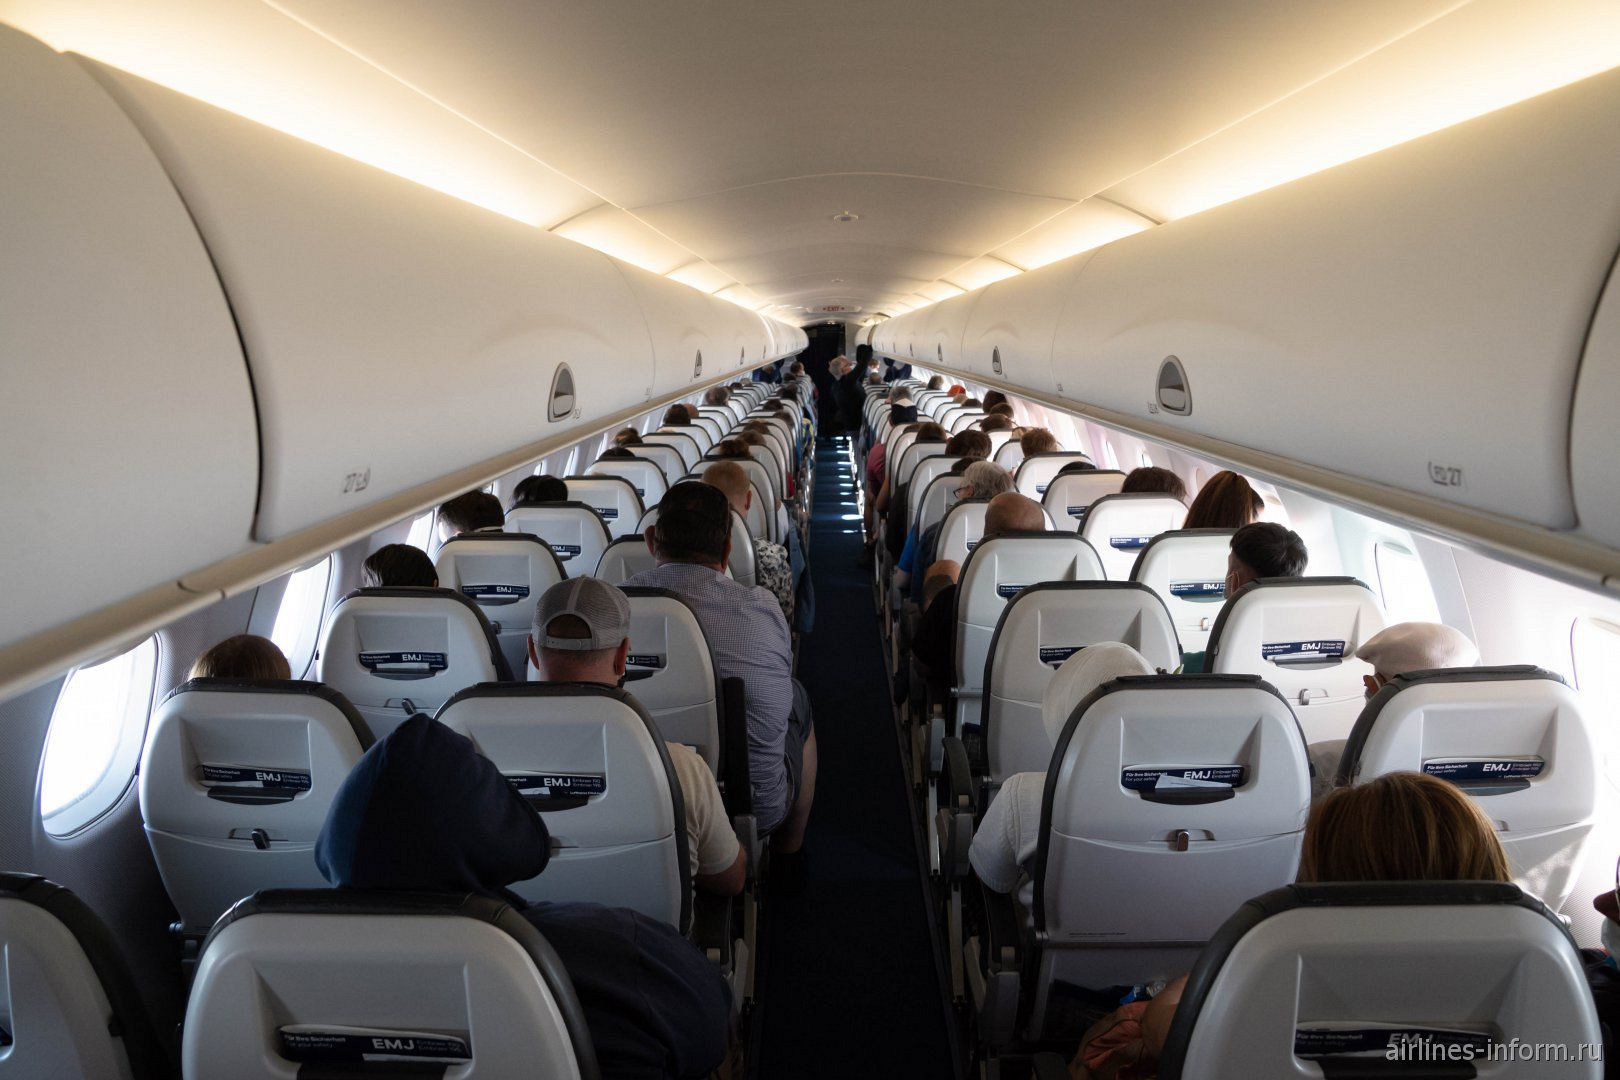 Пассажирский салон самолета Embraer 190 авиакомпании Lufthansa CityLine